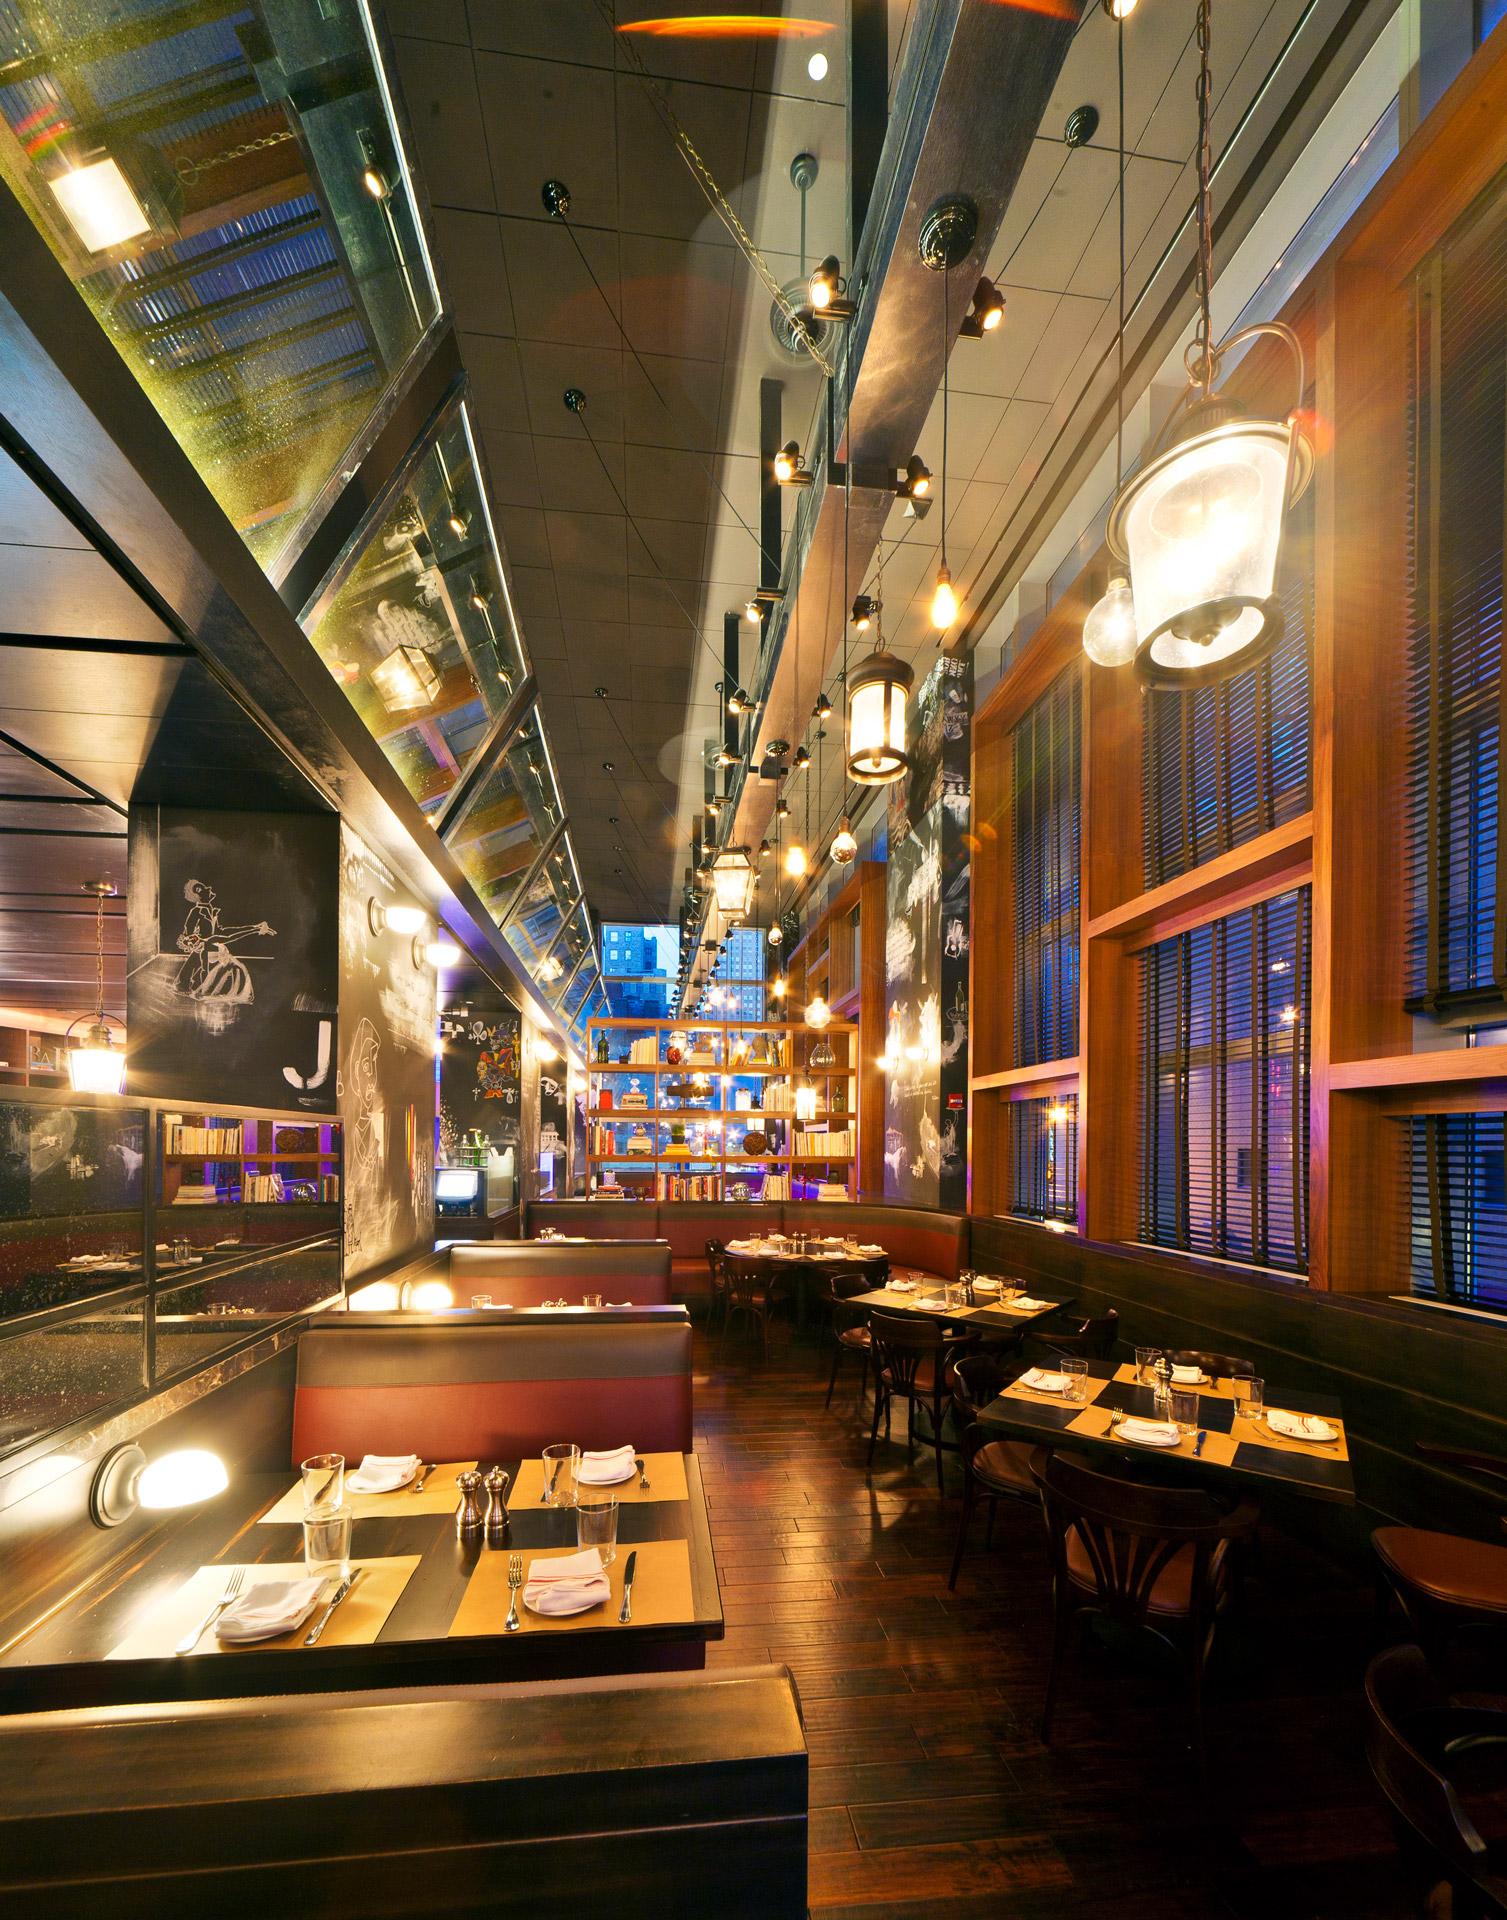 BLT Bar & Grill restaurant interiors